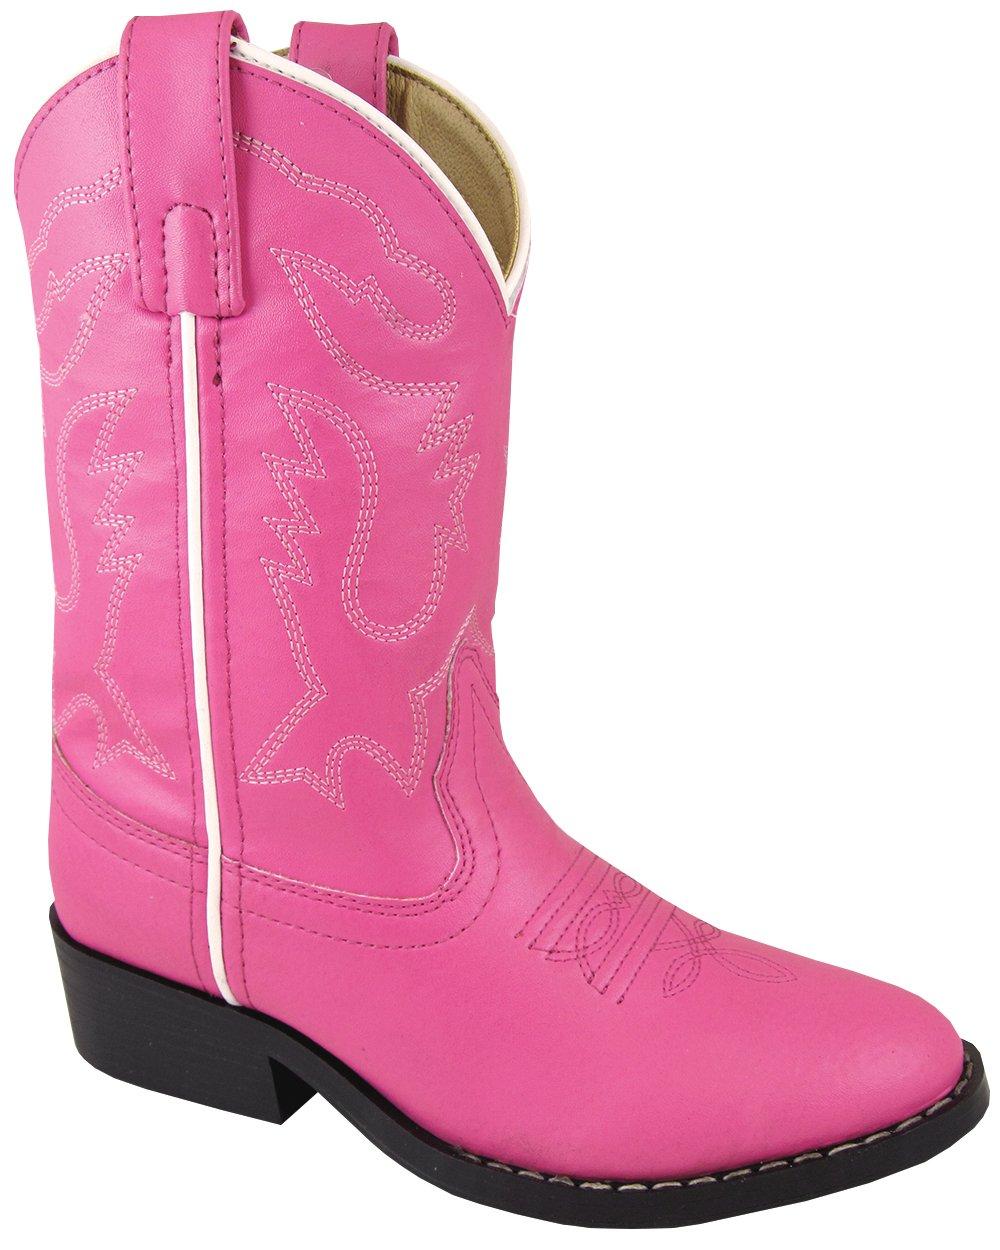 Smoky Mountain Boys Hot Pink Monterey Western Cowboy Boots,Pink,6.5 M US Big Kid Smoky Mountain Boots 1571Y